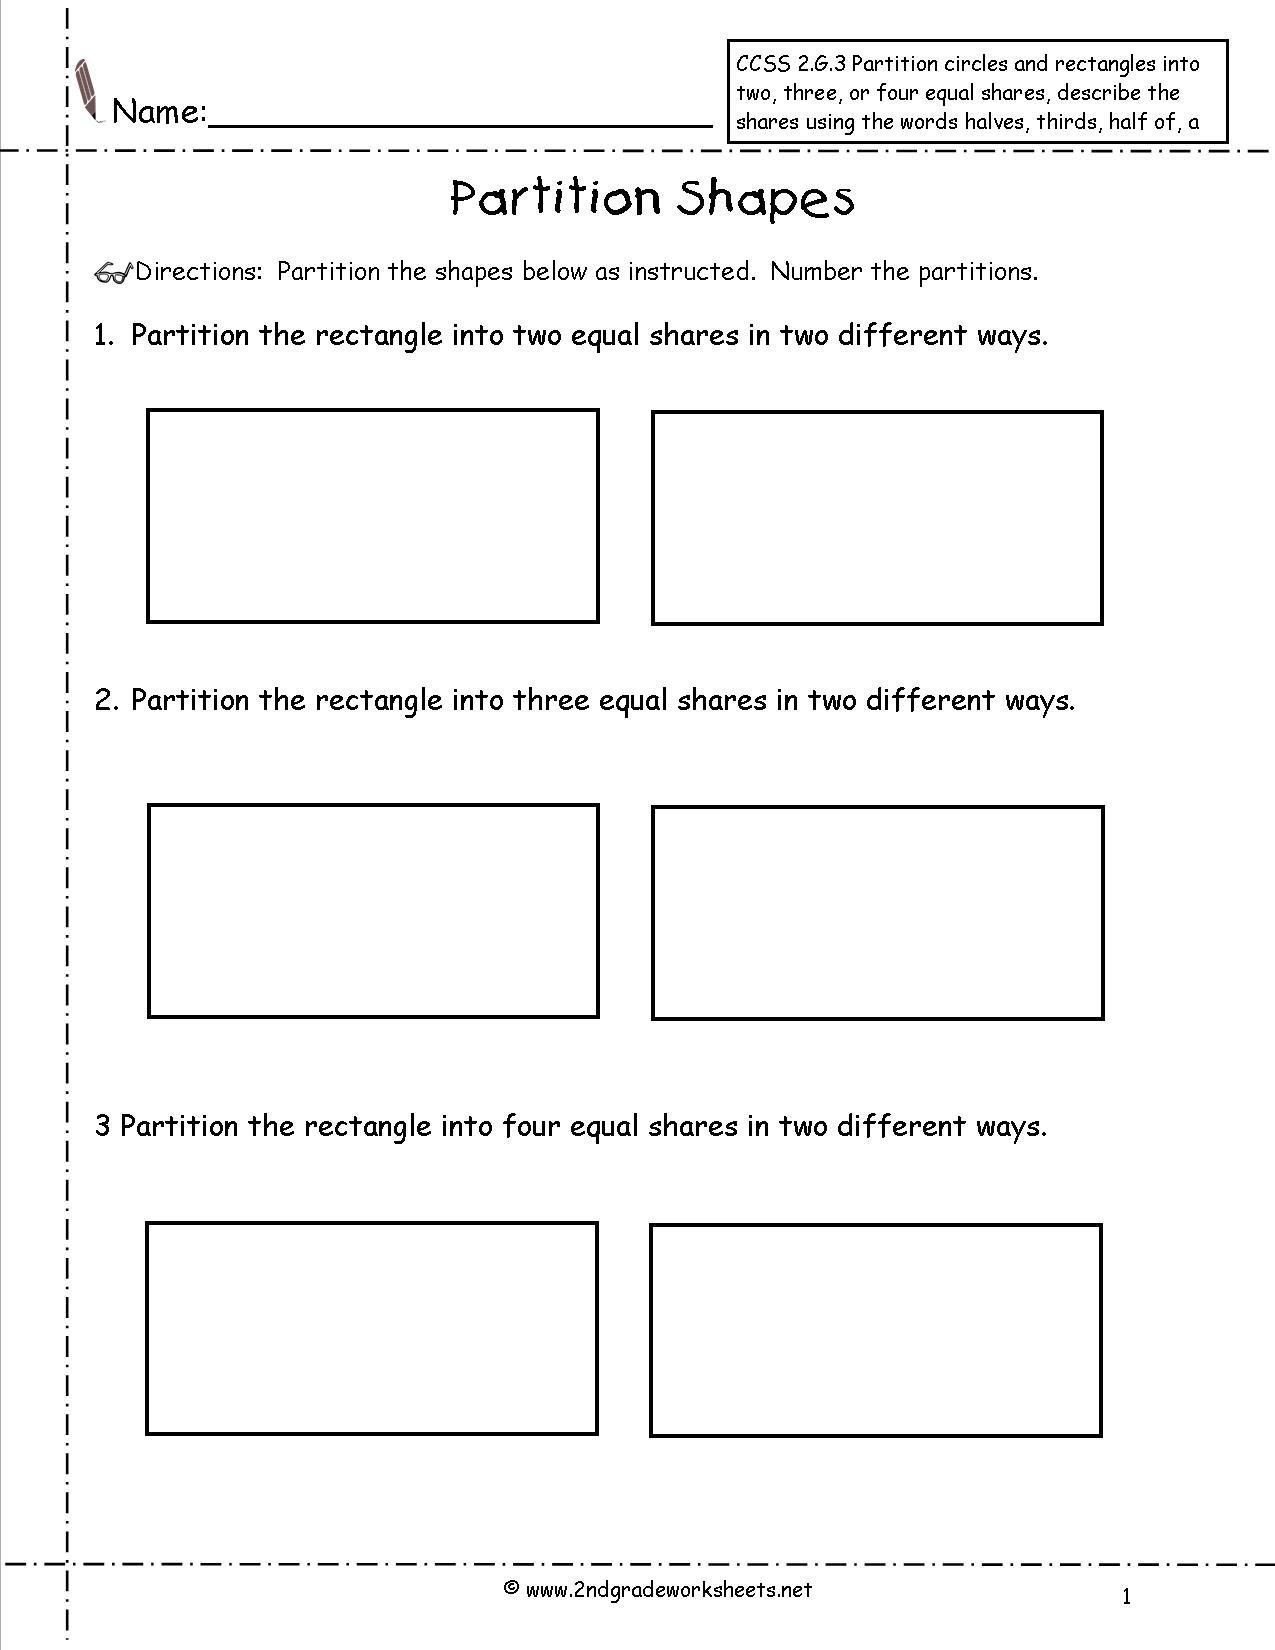 Shapes Worksheets 2nd Grade Ccss 2 G 3 Worksheets Partition Shapes